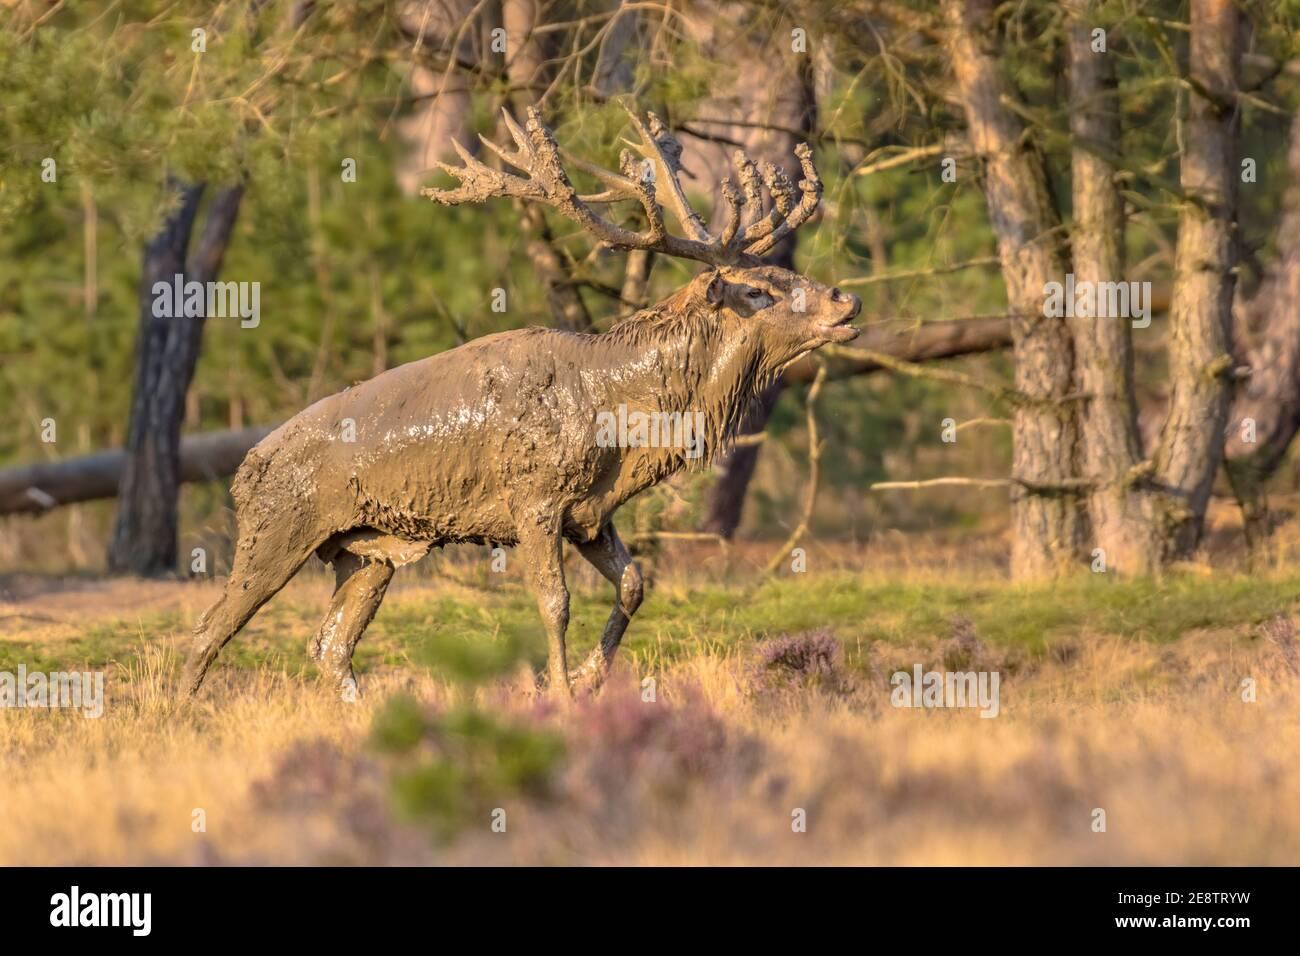 Male Red deer (Cervus elaphus) stag during rutting season in autumn, Veluwe, Netherlands. Wildlife scene of nature in Europe. Stock Photo